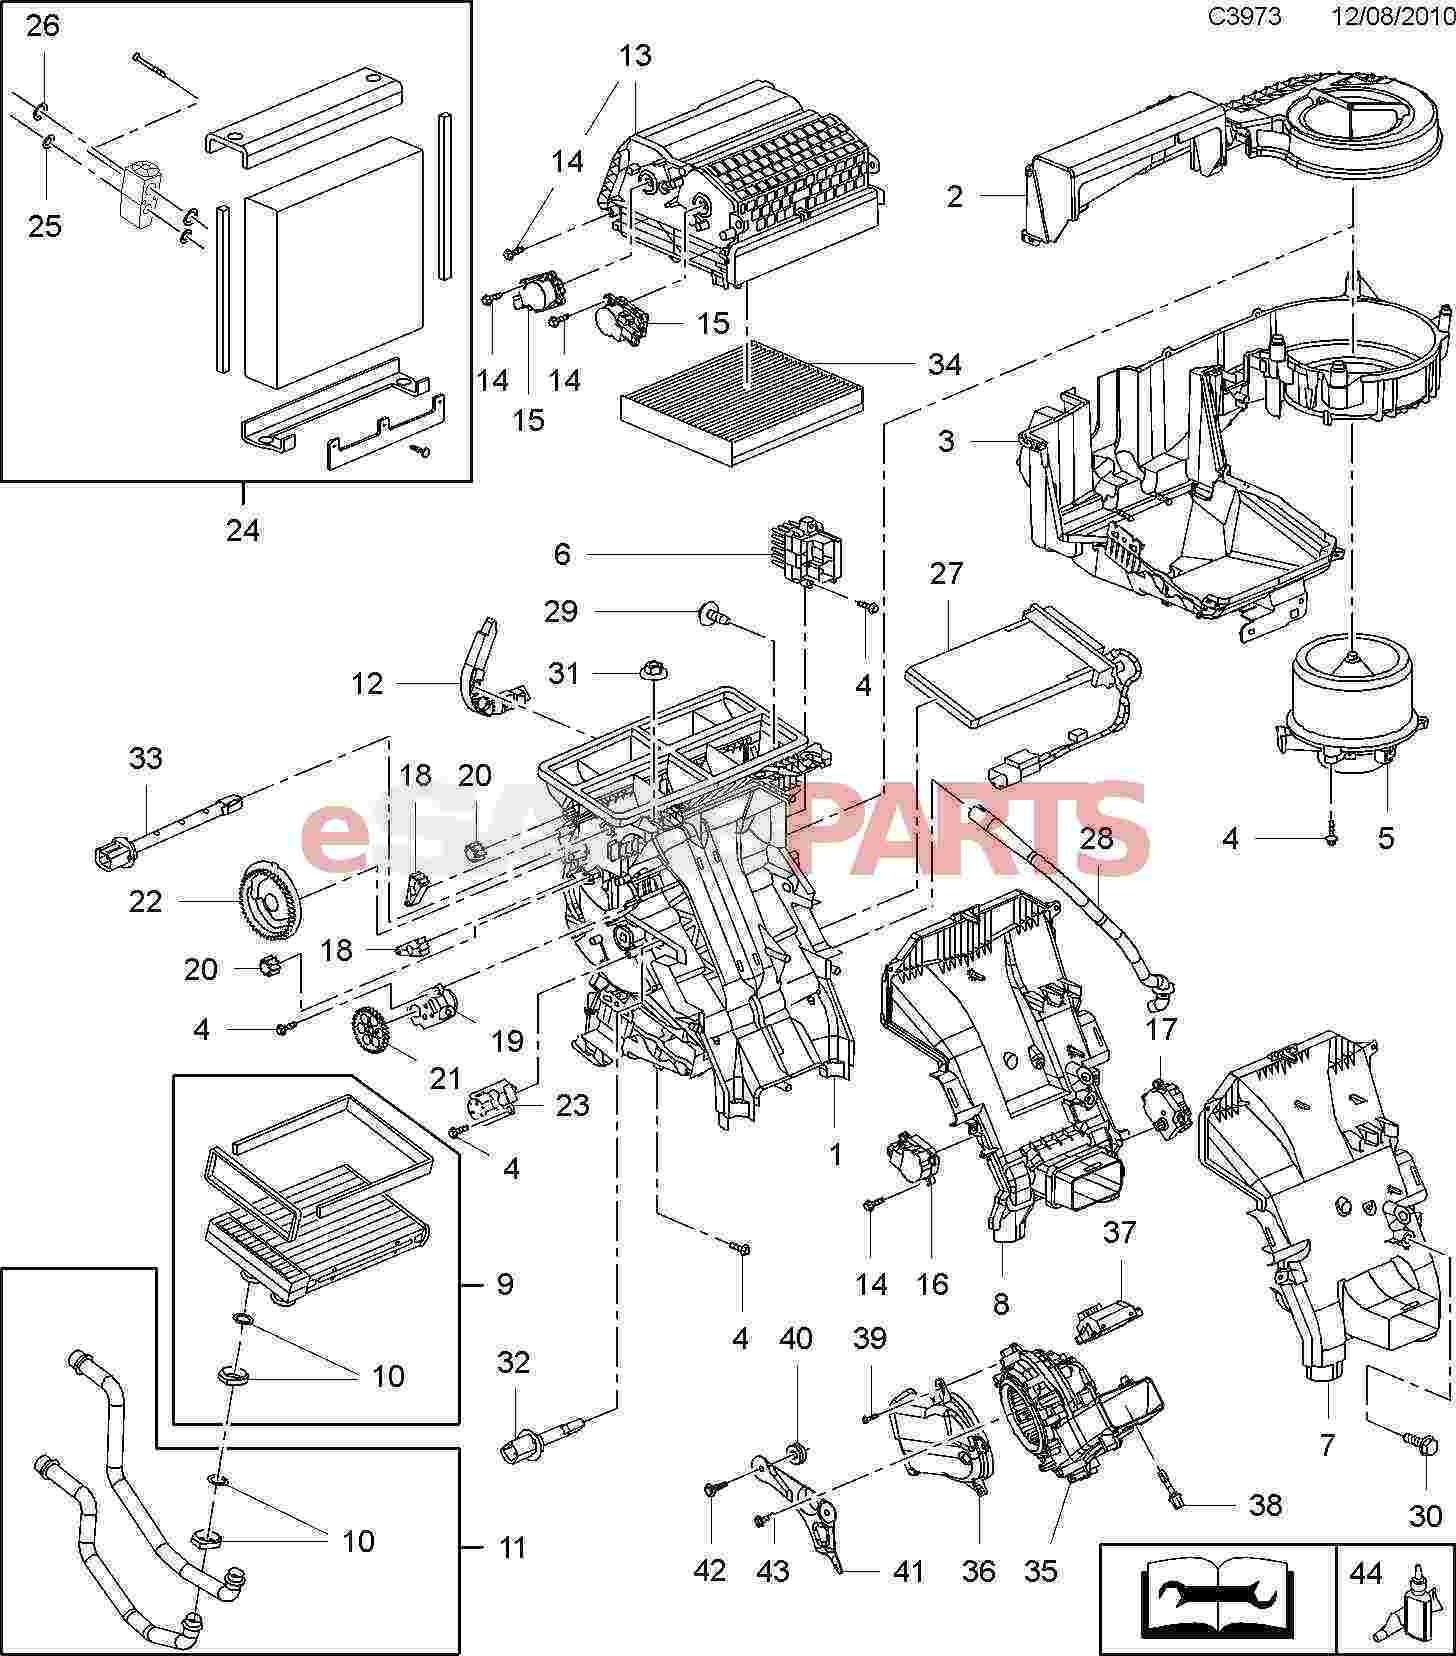 Auto Air Conditioning Parts Diagram Esaabparts Saab 9 5 650 Heating & Air Conditioning Parts Of Auto Air Conditioning Parts Diagram